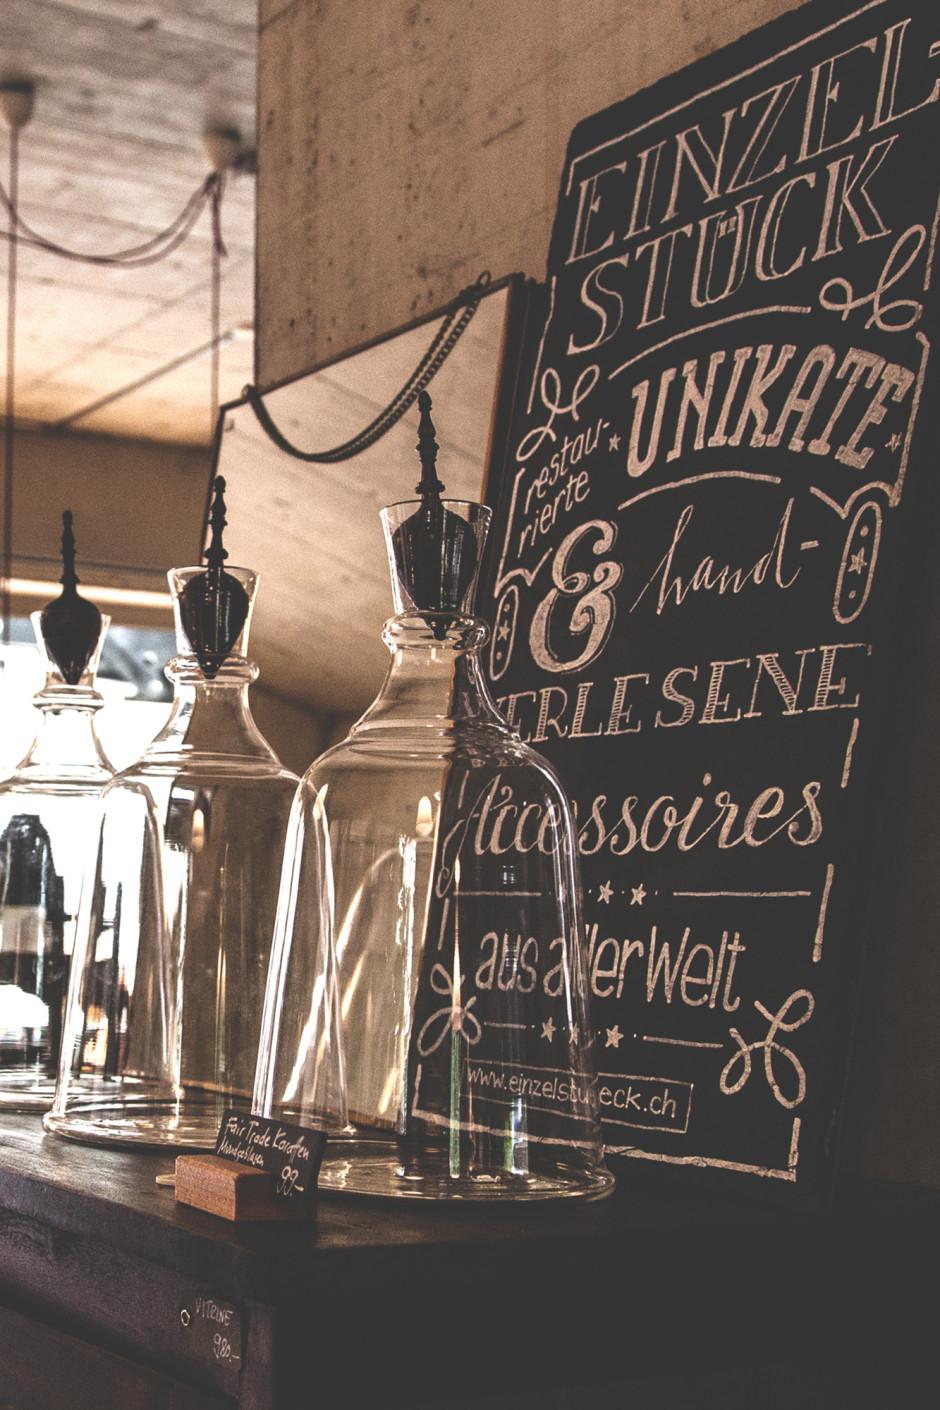 Fotograf Adliswil, Fotografie Adliswil, Fotograf Zürich, Webdesign Adliswil, Webdesign Zürich